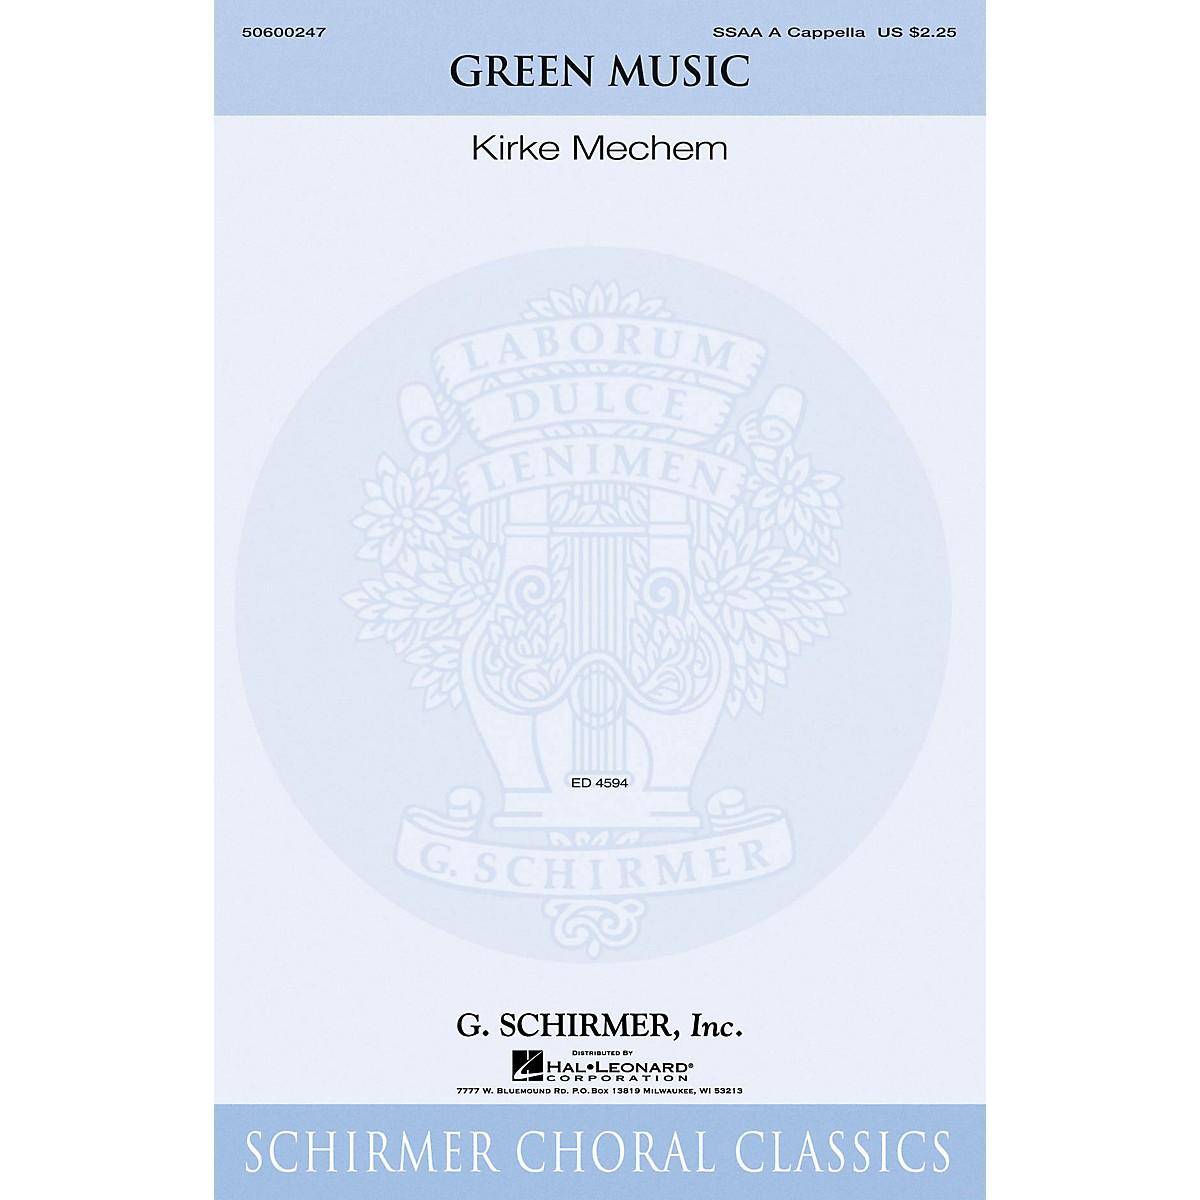 G. Schirmer Green Music SSAA A Cappella composed by Kirke Mechem